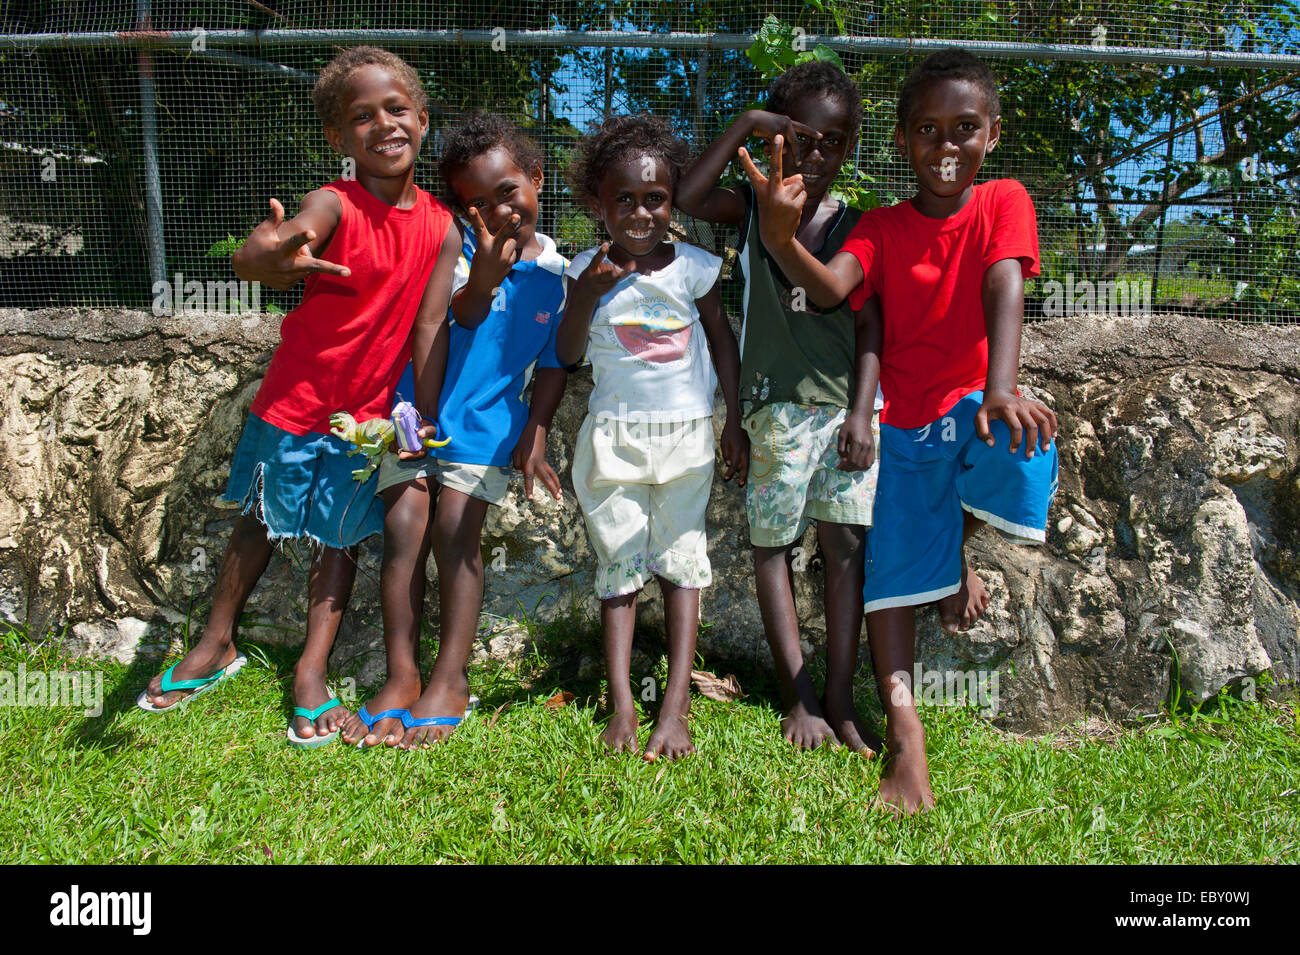 Group of local children, Honiara, Solomon Islands - Stock Image